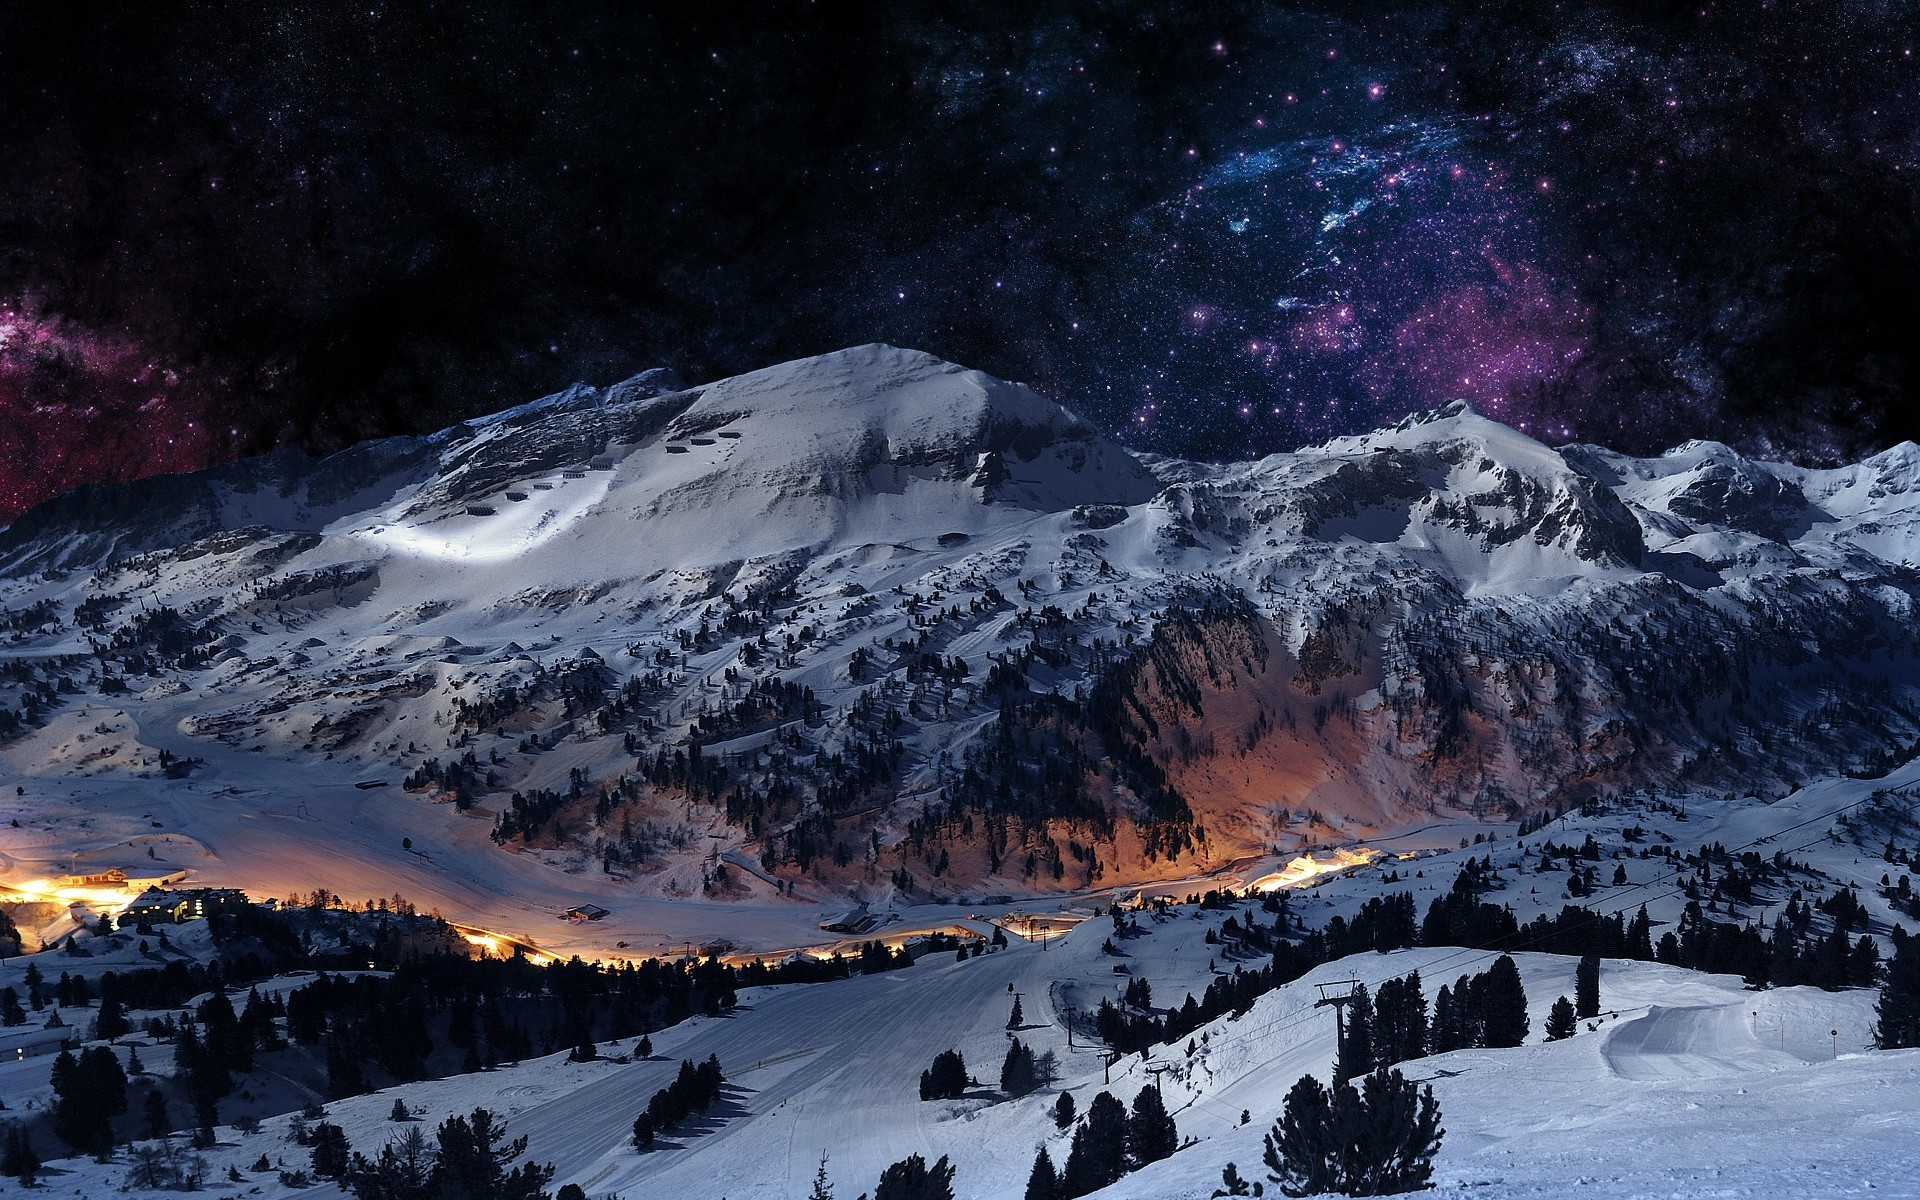 Digital Art Landscapes Mountains Night Sky Scene Winter Hd Wallpaper 944634  – Wallb.com